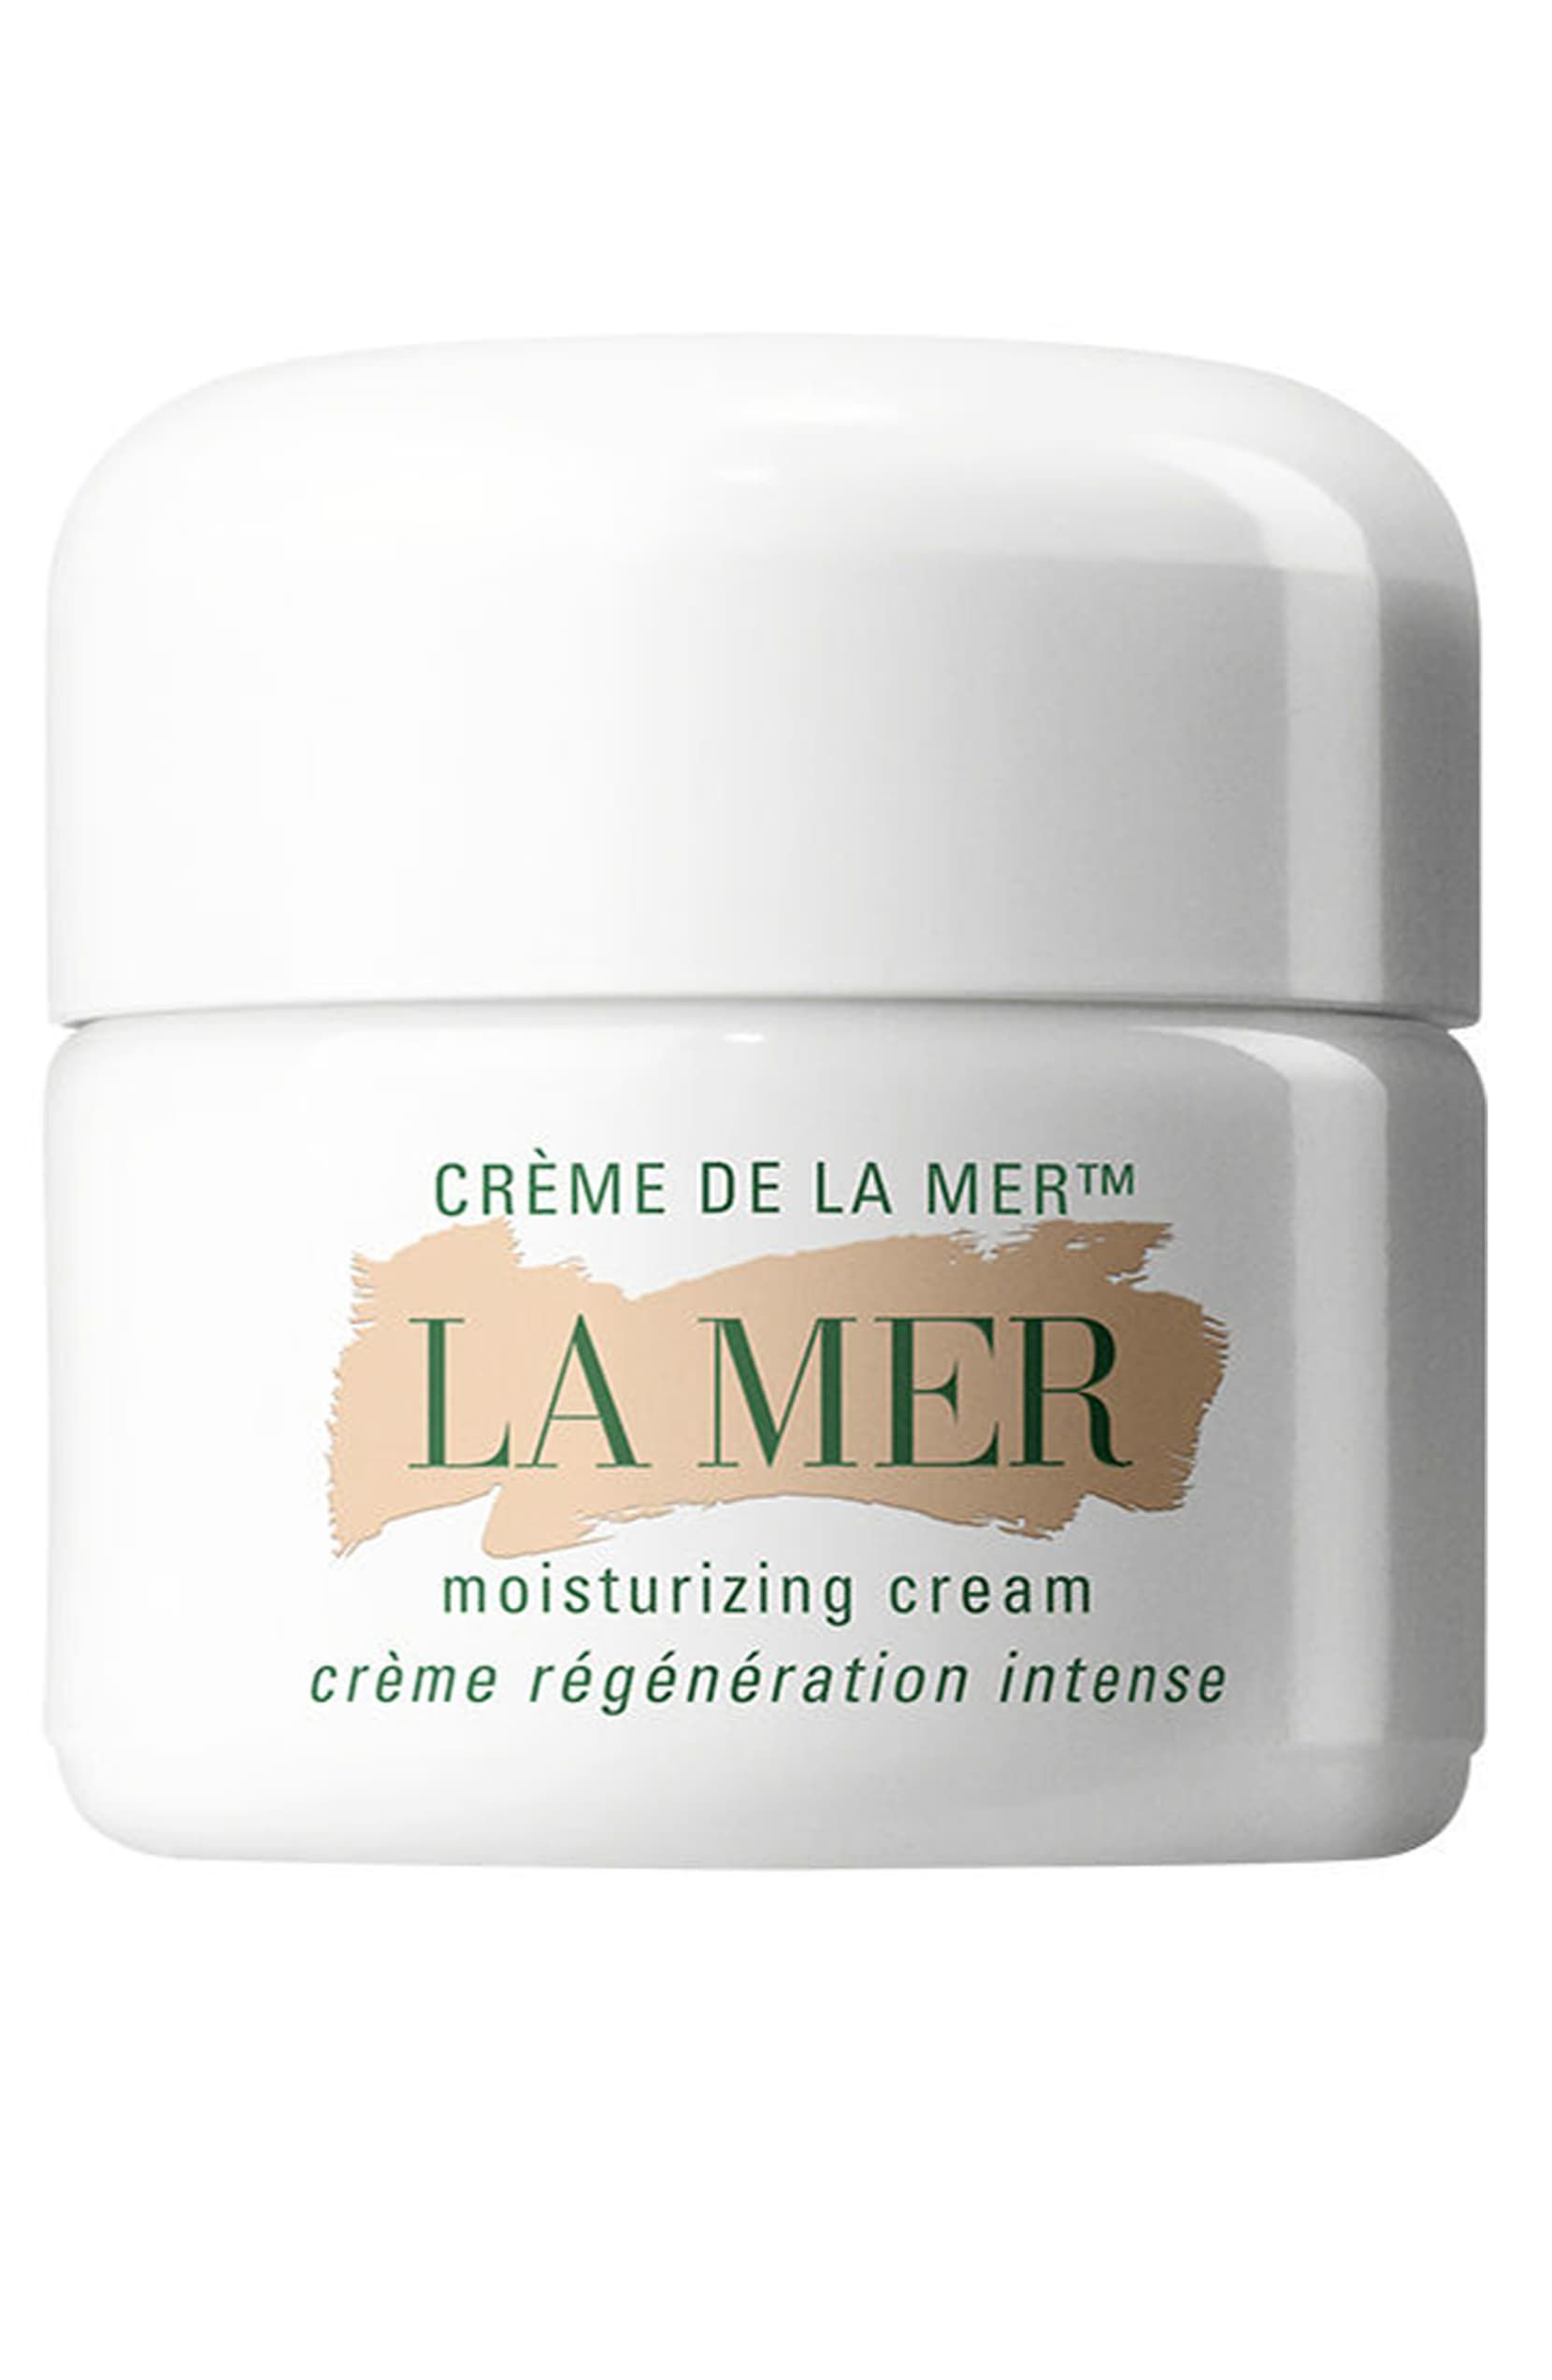 Kendall Jenner's favorite skin care: Creme de la Mer